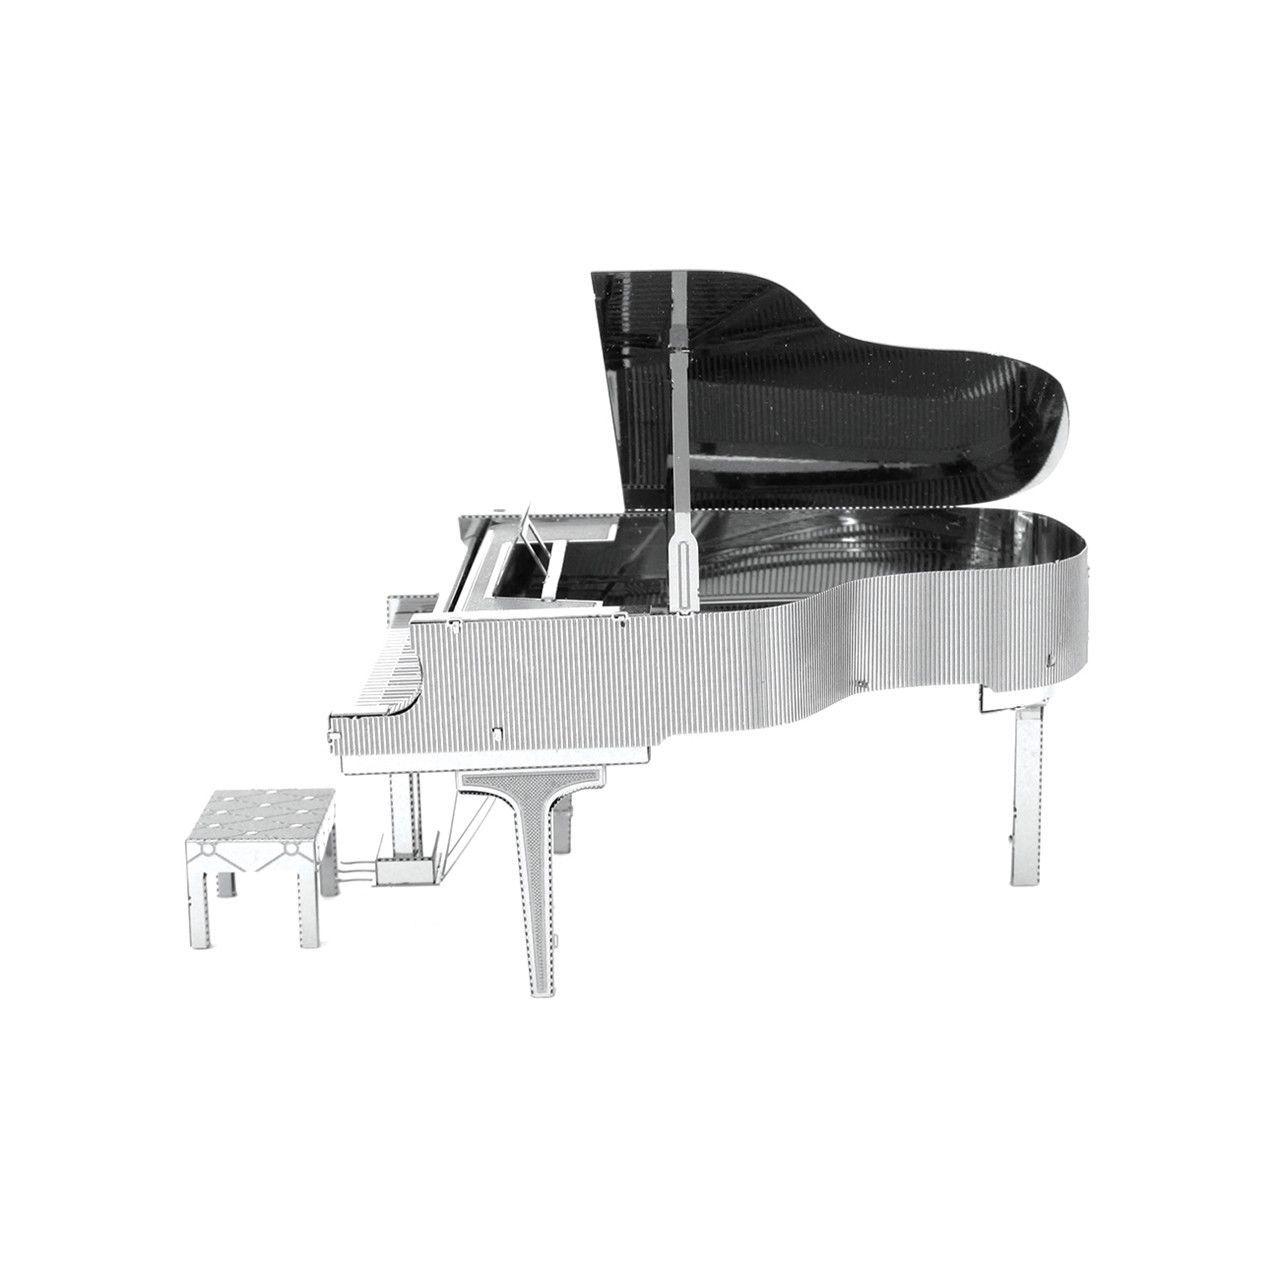 Metal Earth 3D Laser Cut Steel Model Kit Grand Piano Toy Gift